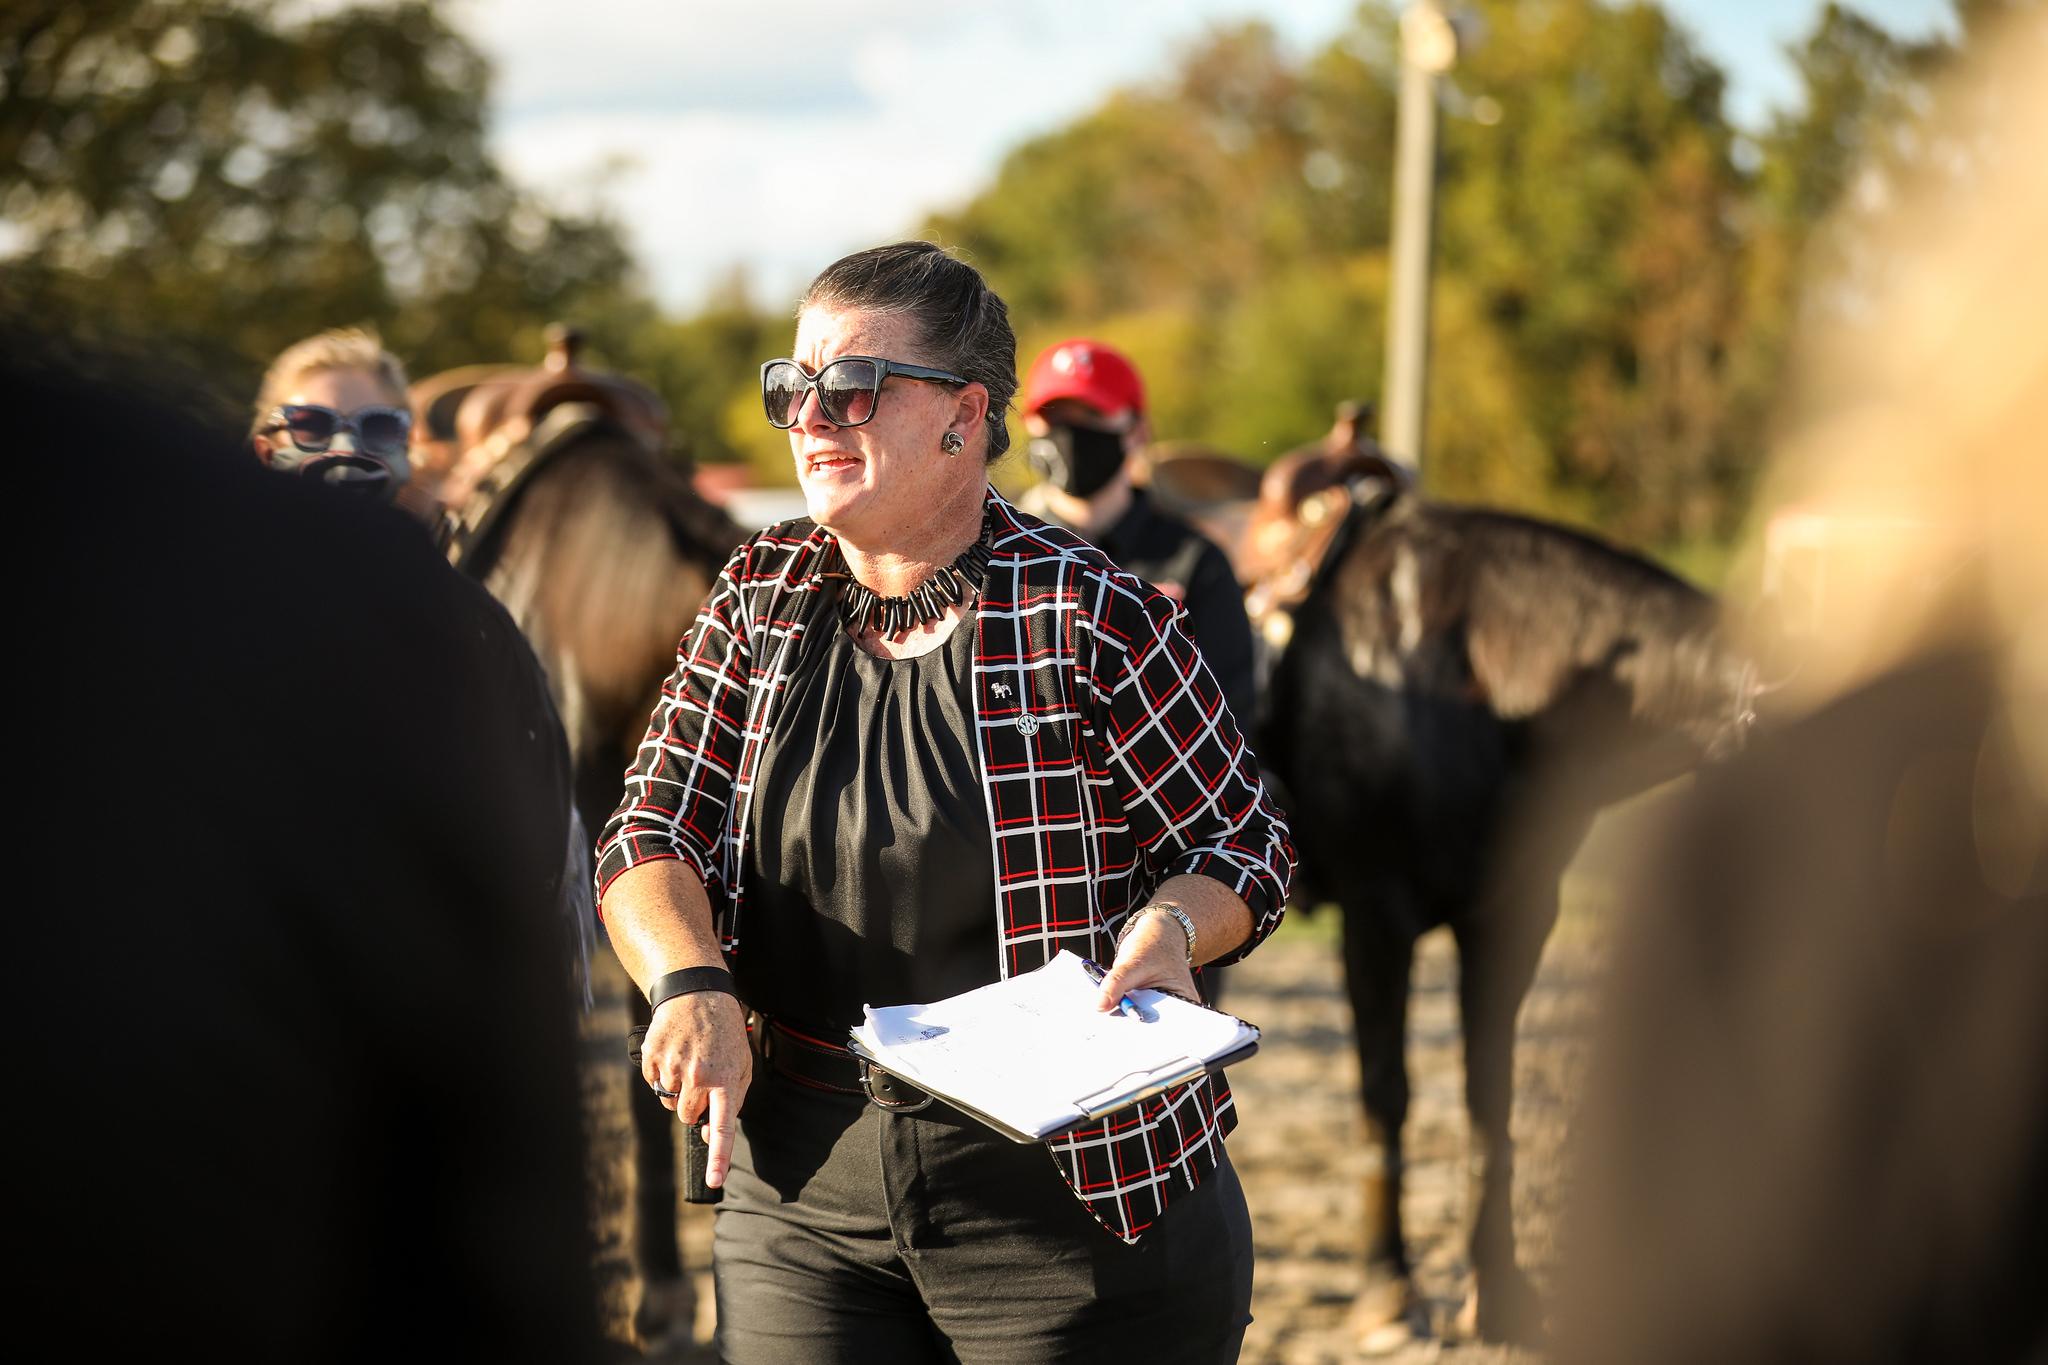 Georgia head coach Meghan Boenig during an equestrian meet between Georgia and Auburn at the UGA Equestrian Complex in Bishop, Ga., on Saturday, Oct. 23, 2020. (Photo by Chamberlain Smith)